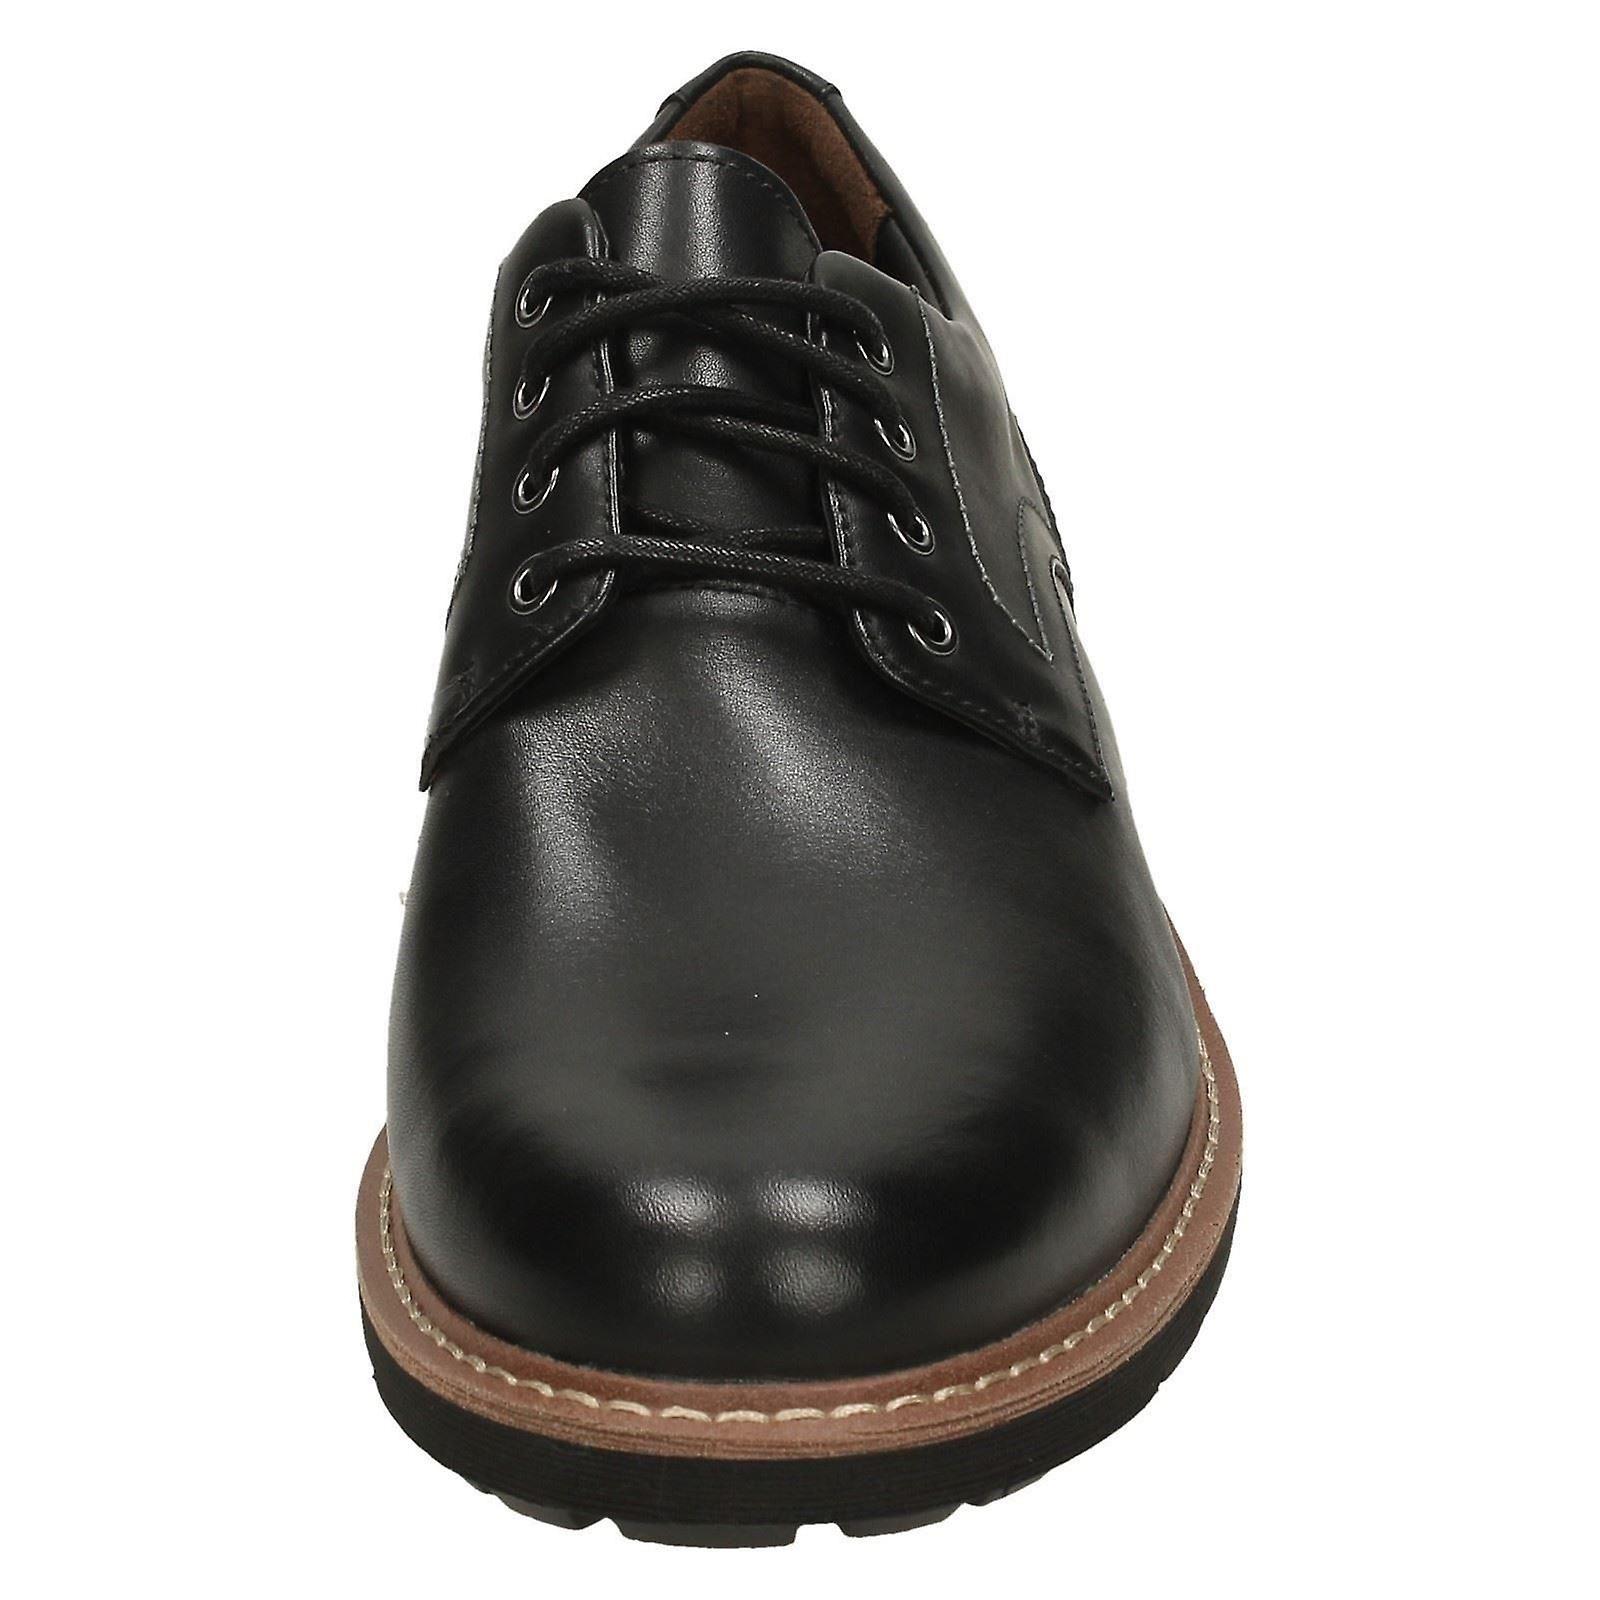 Details zu Herren Clarks Smart Schuhe Batcombe Hall